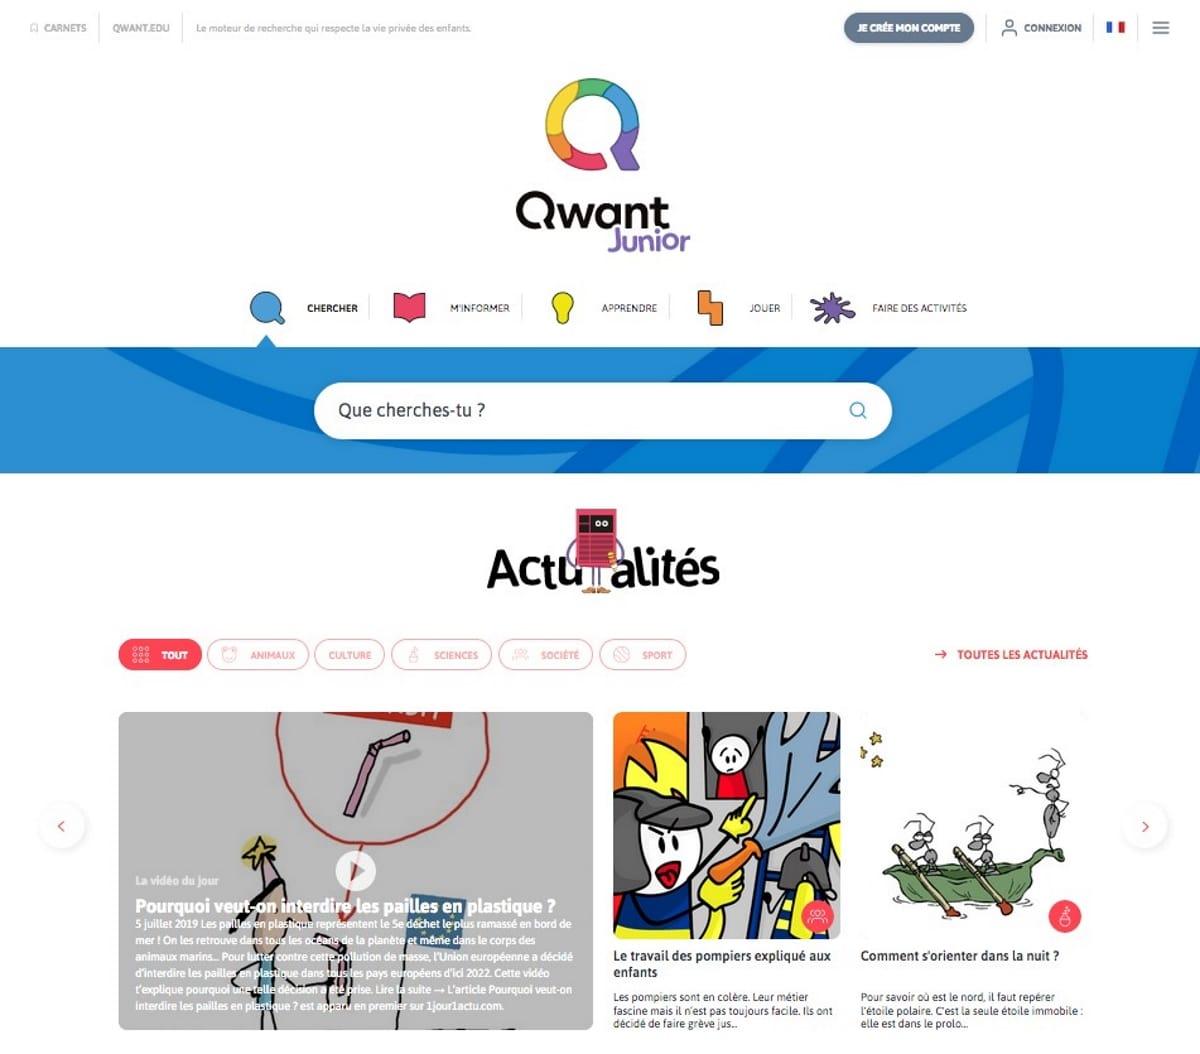 Qwant Junior page